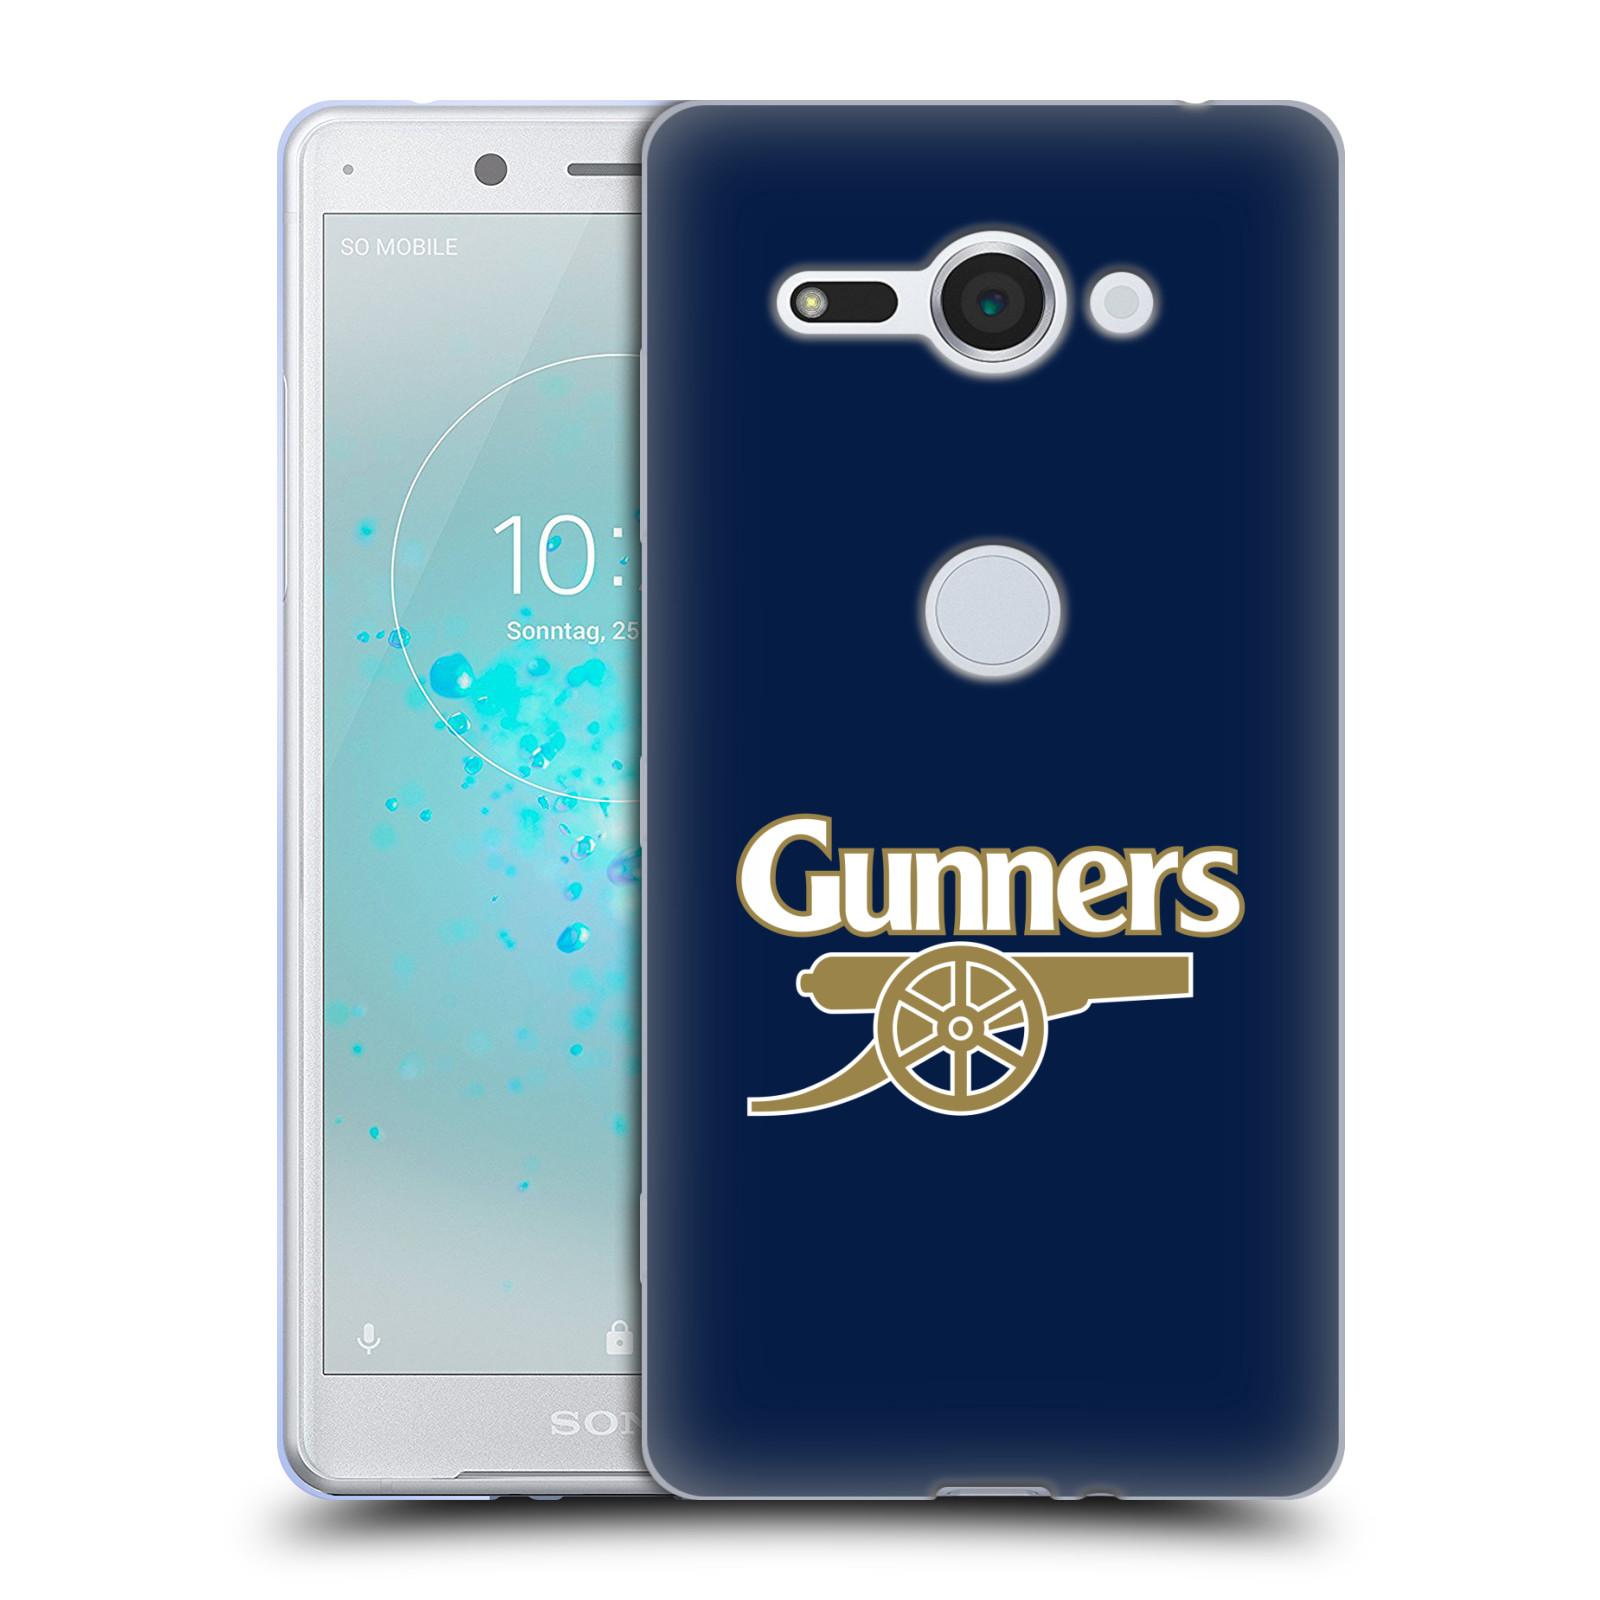 Silikonové pouzdro na mobil Sony Xperia XZ2 Compact - Head Case - Arsenal FC - Gunners